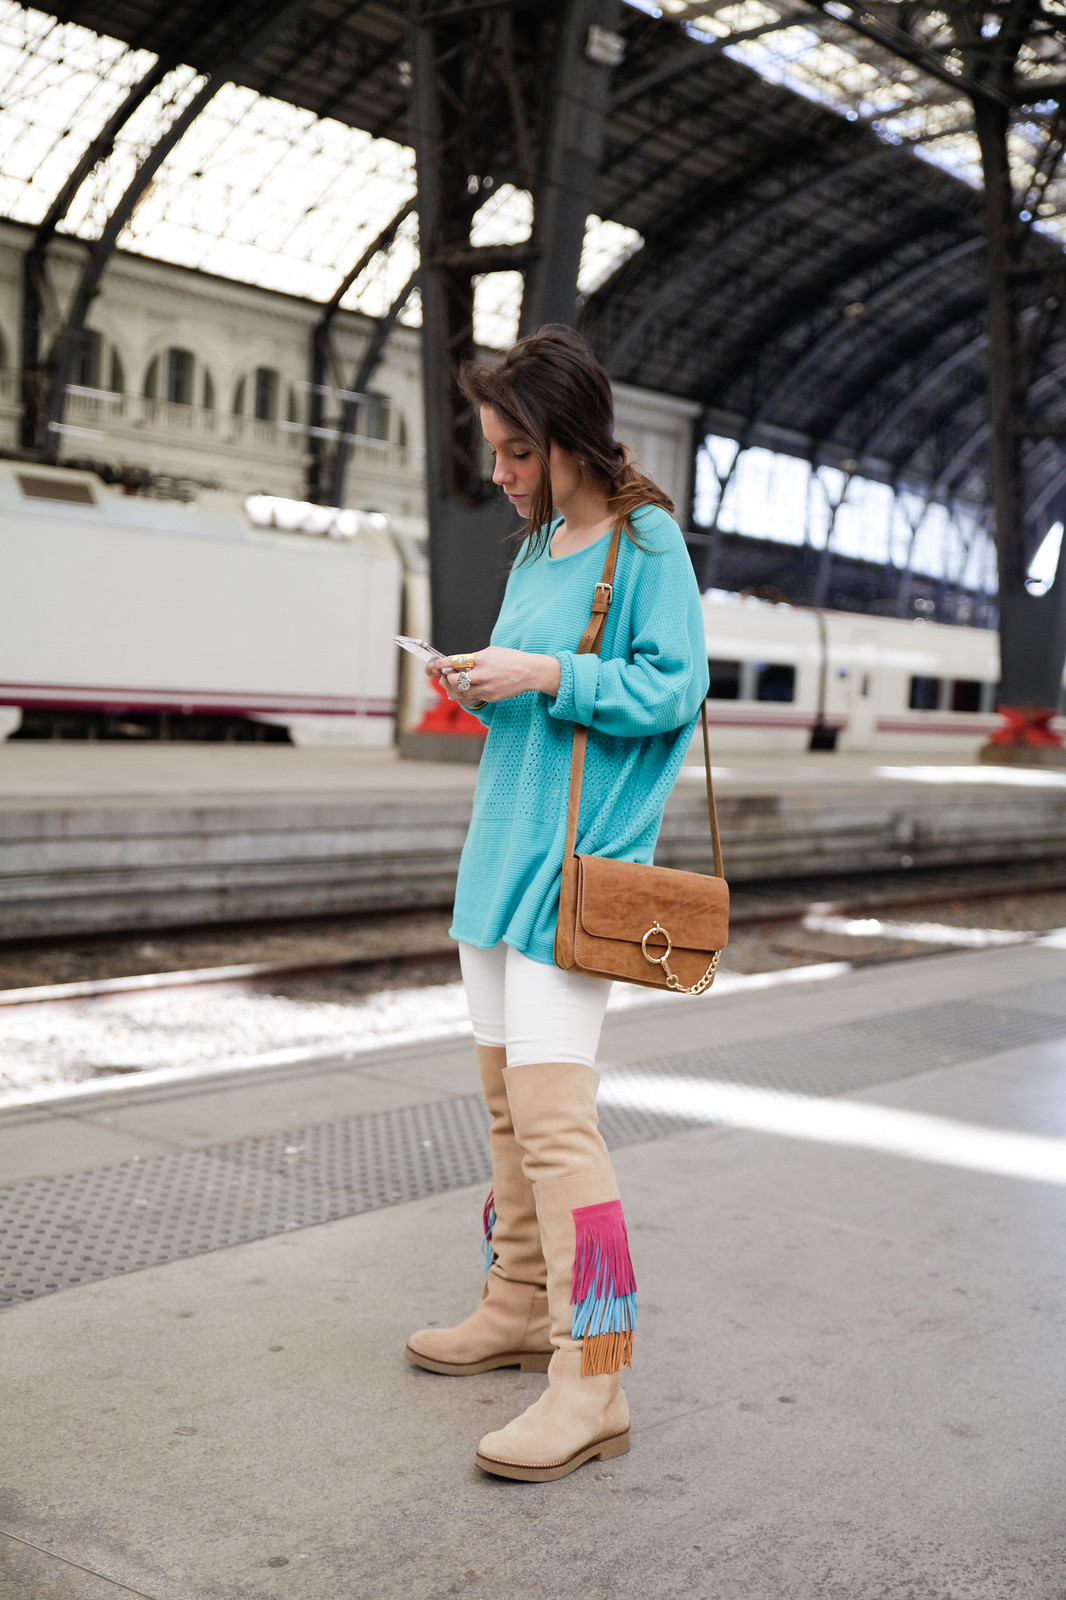 01_como_combinar_la_ropa_verde_turquesa_ideas_look_street_style_theguestgirl_ruga_boots_fringes_barcelona_influencer_top_blogger